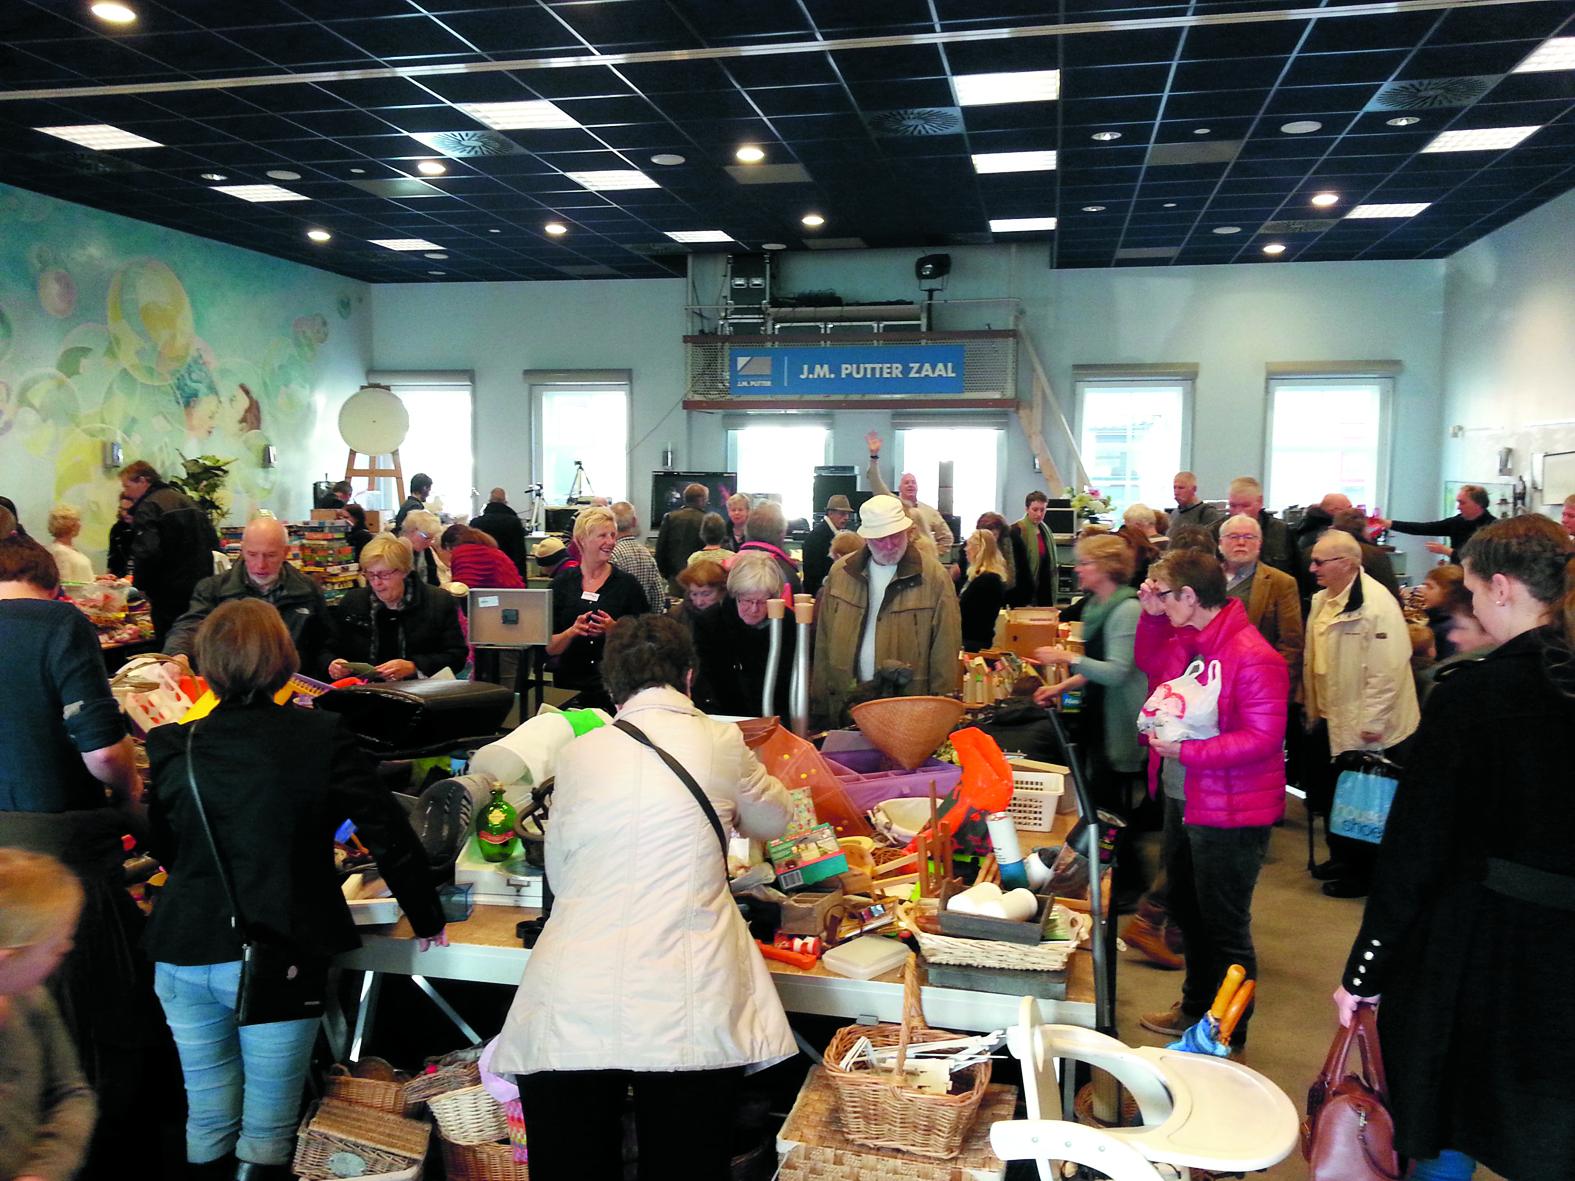 De rommelmarkt in 2017 was druk bezocht. (Foto PB)